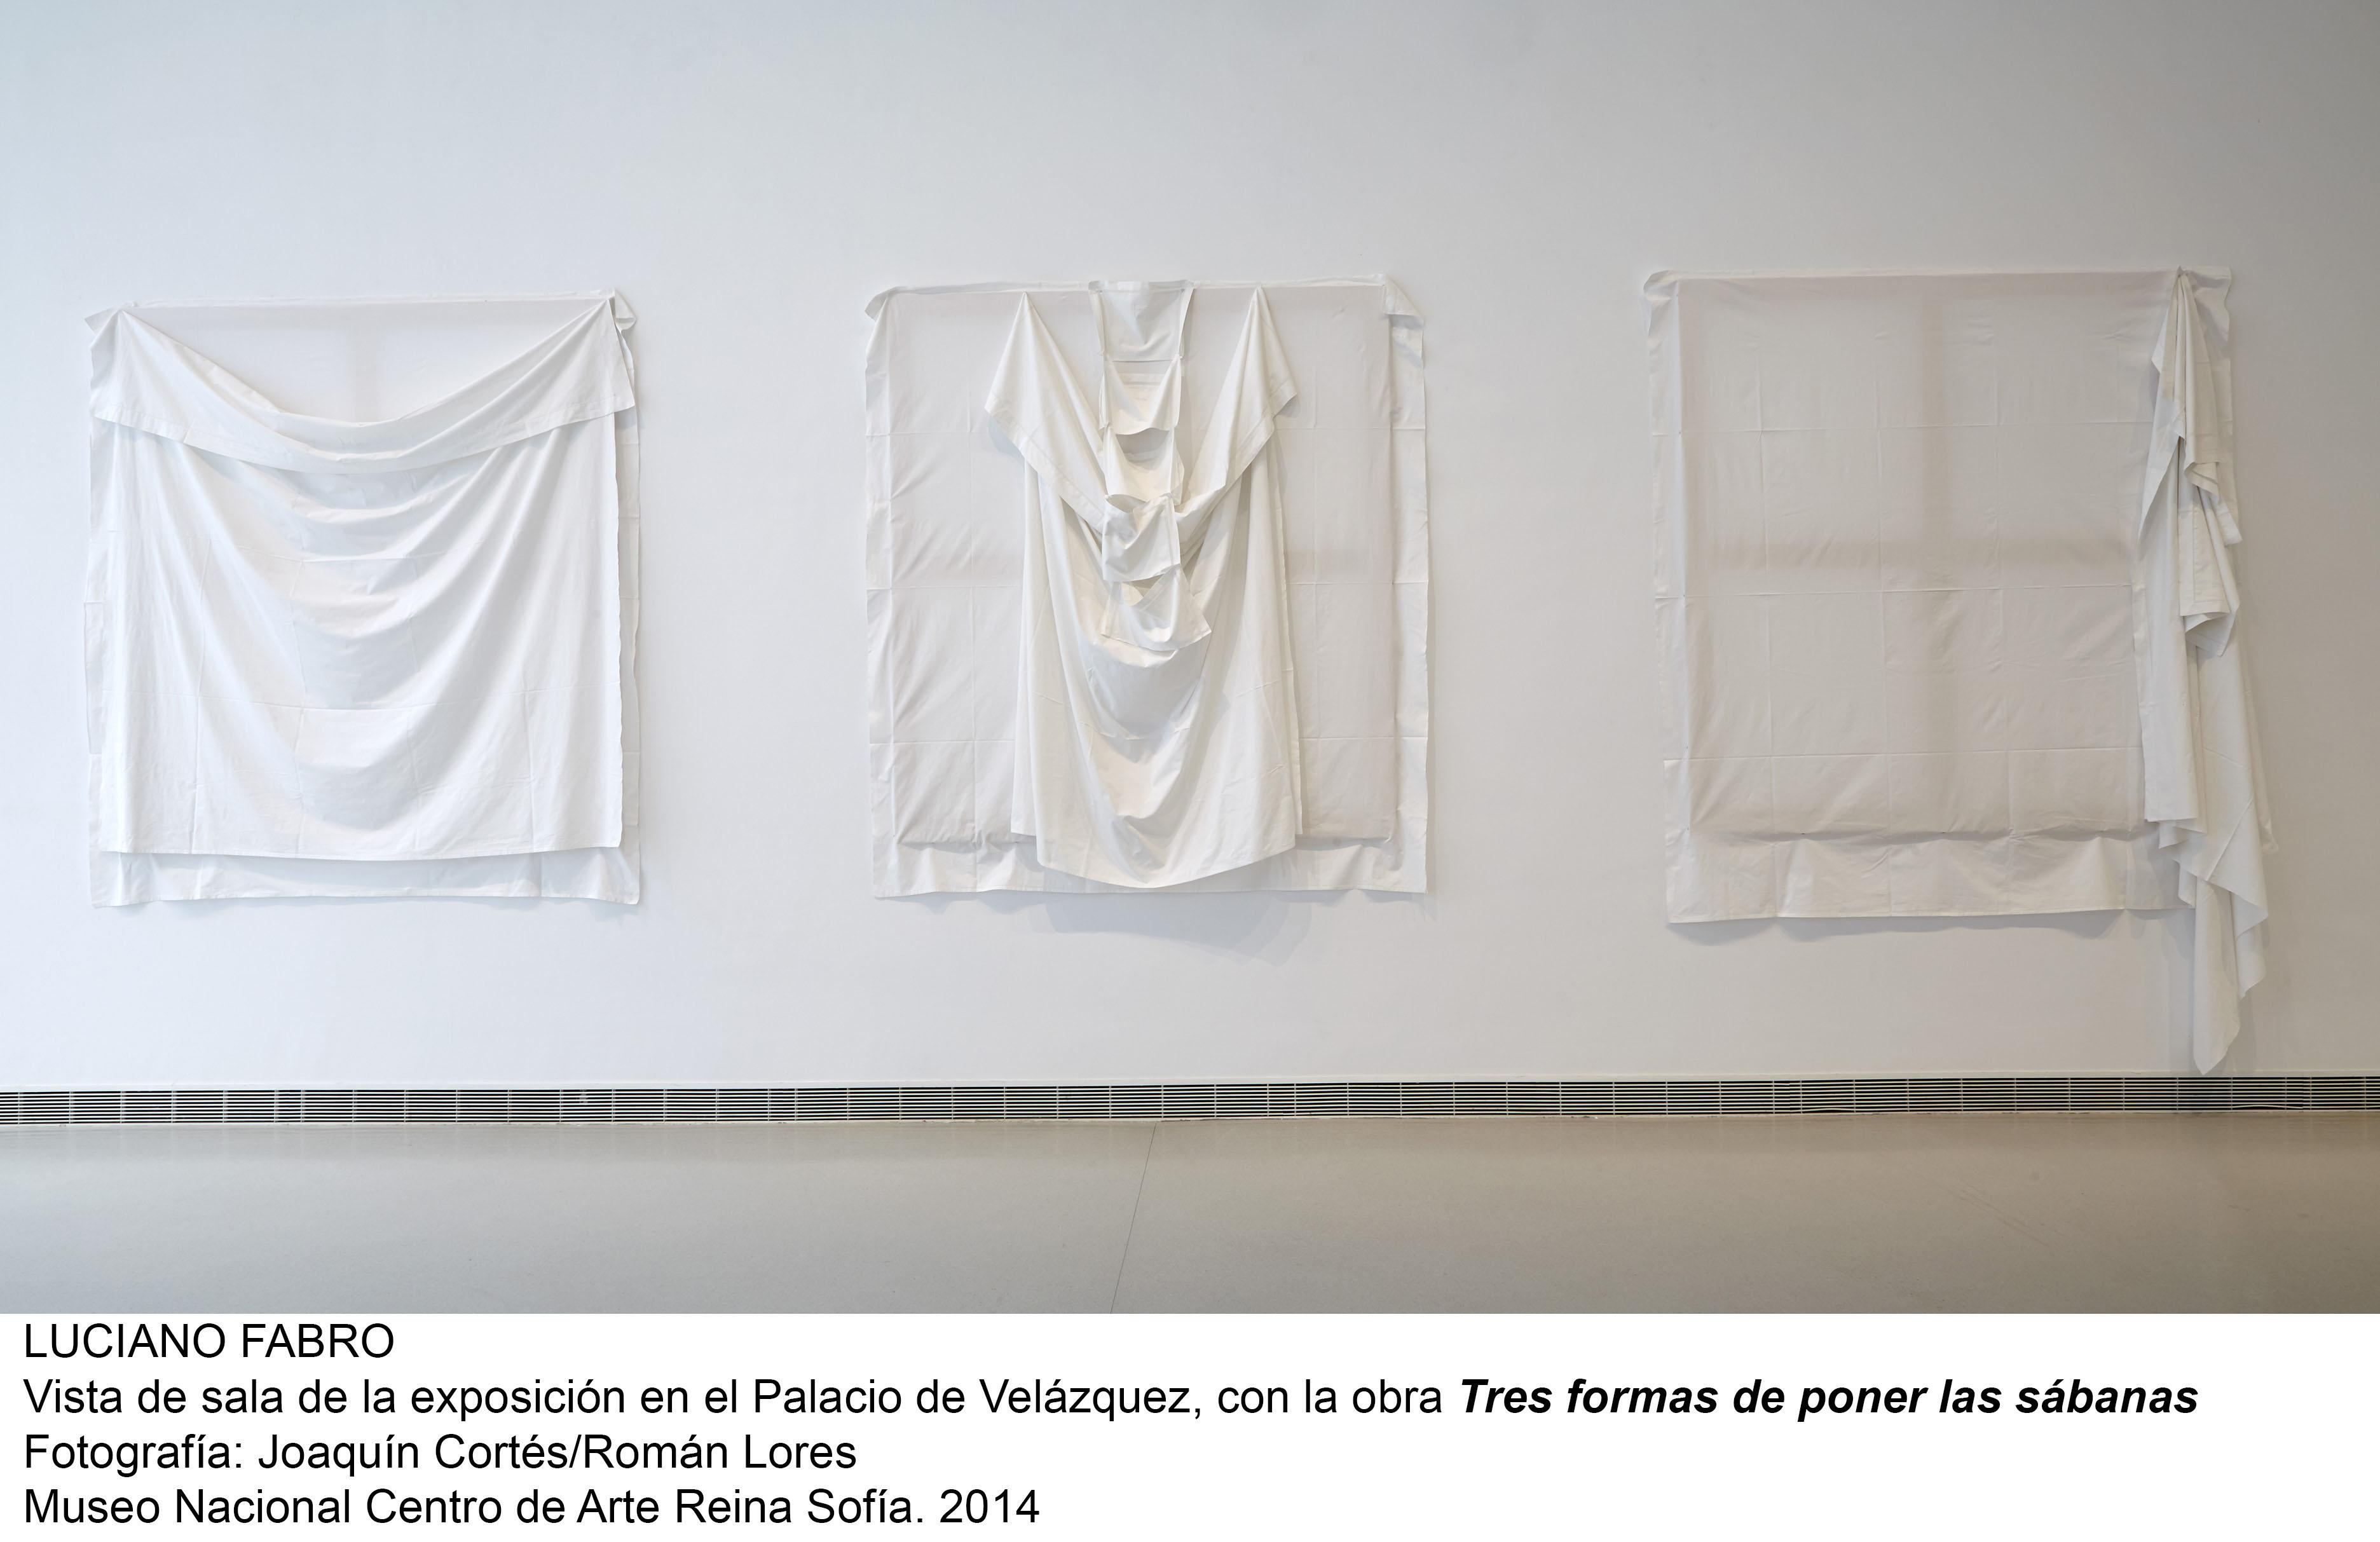 Prensa luciano fabro for Sala 0 palacio de la prensa